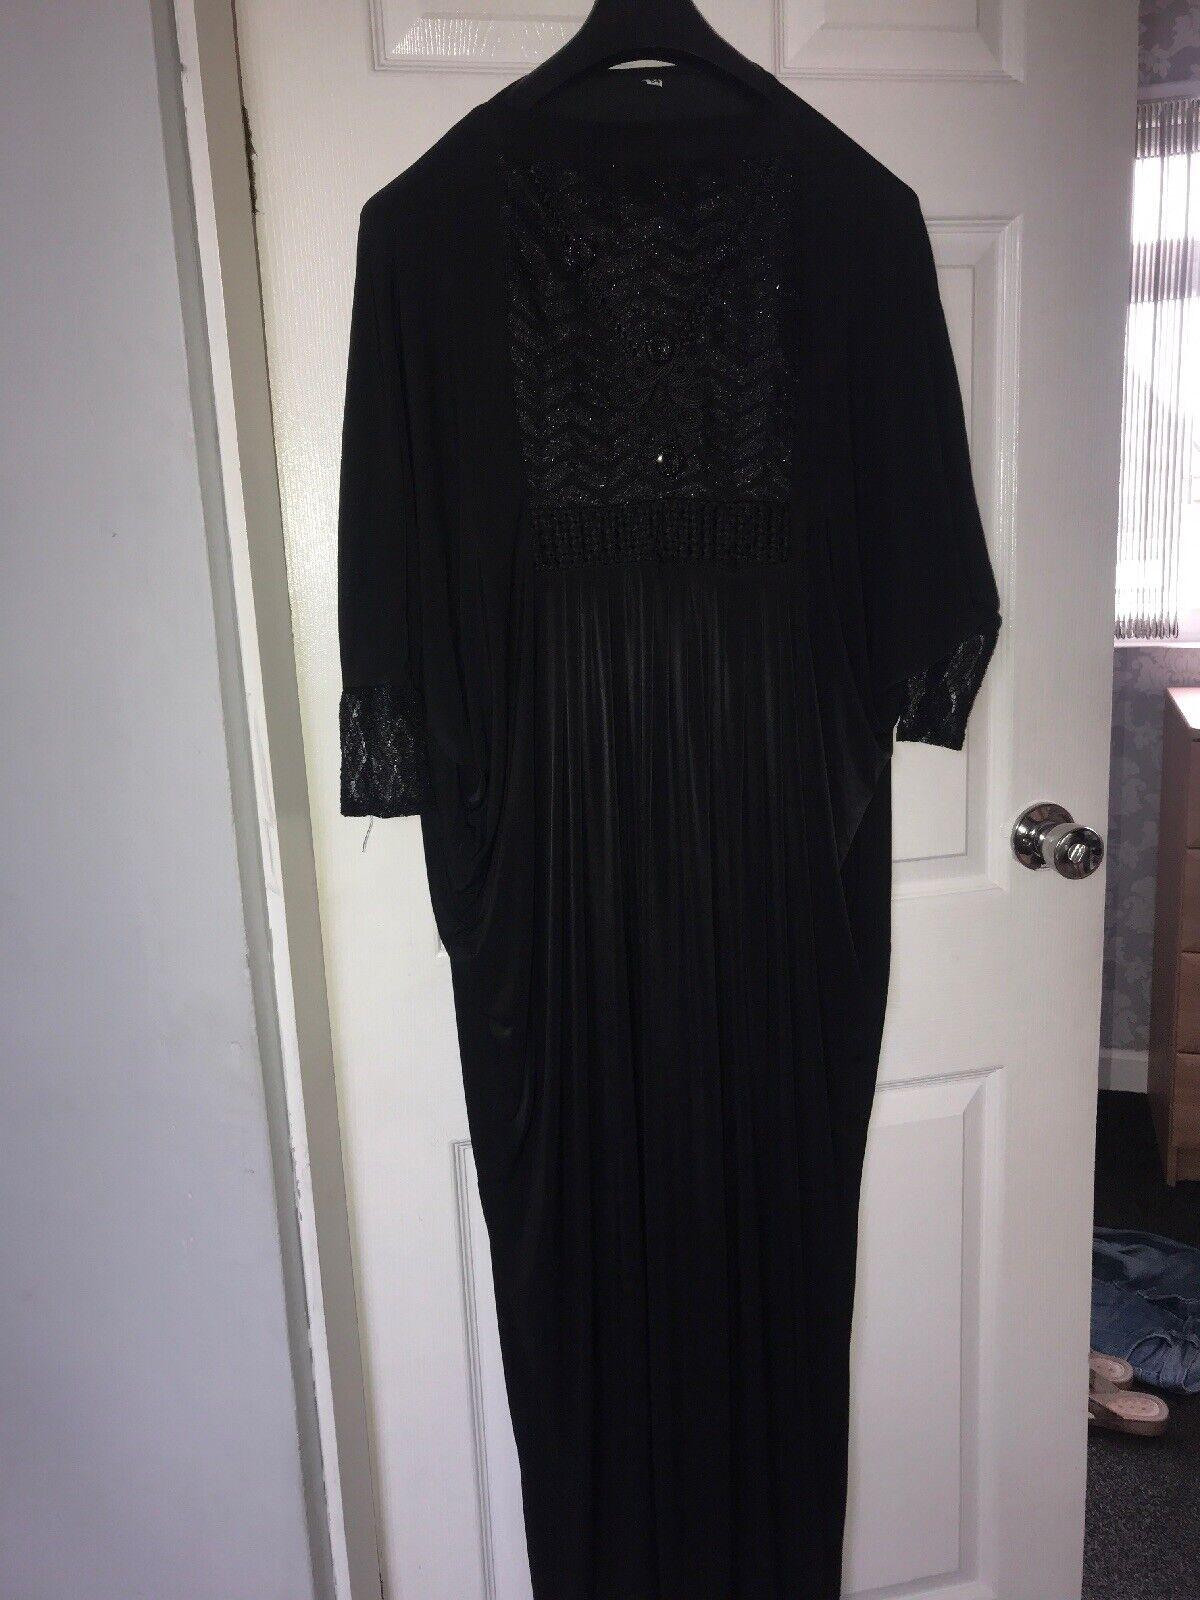 All Black Abaya With Plain Black Matching Scarf Size 54